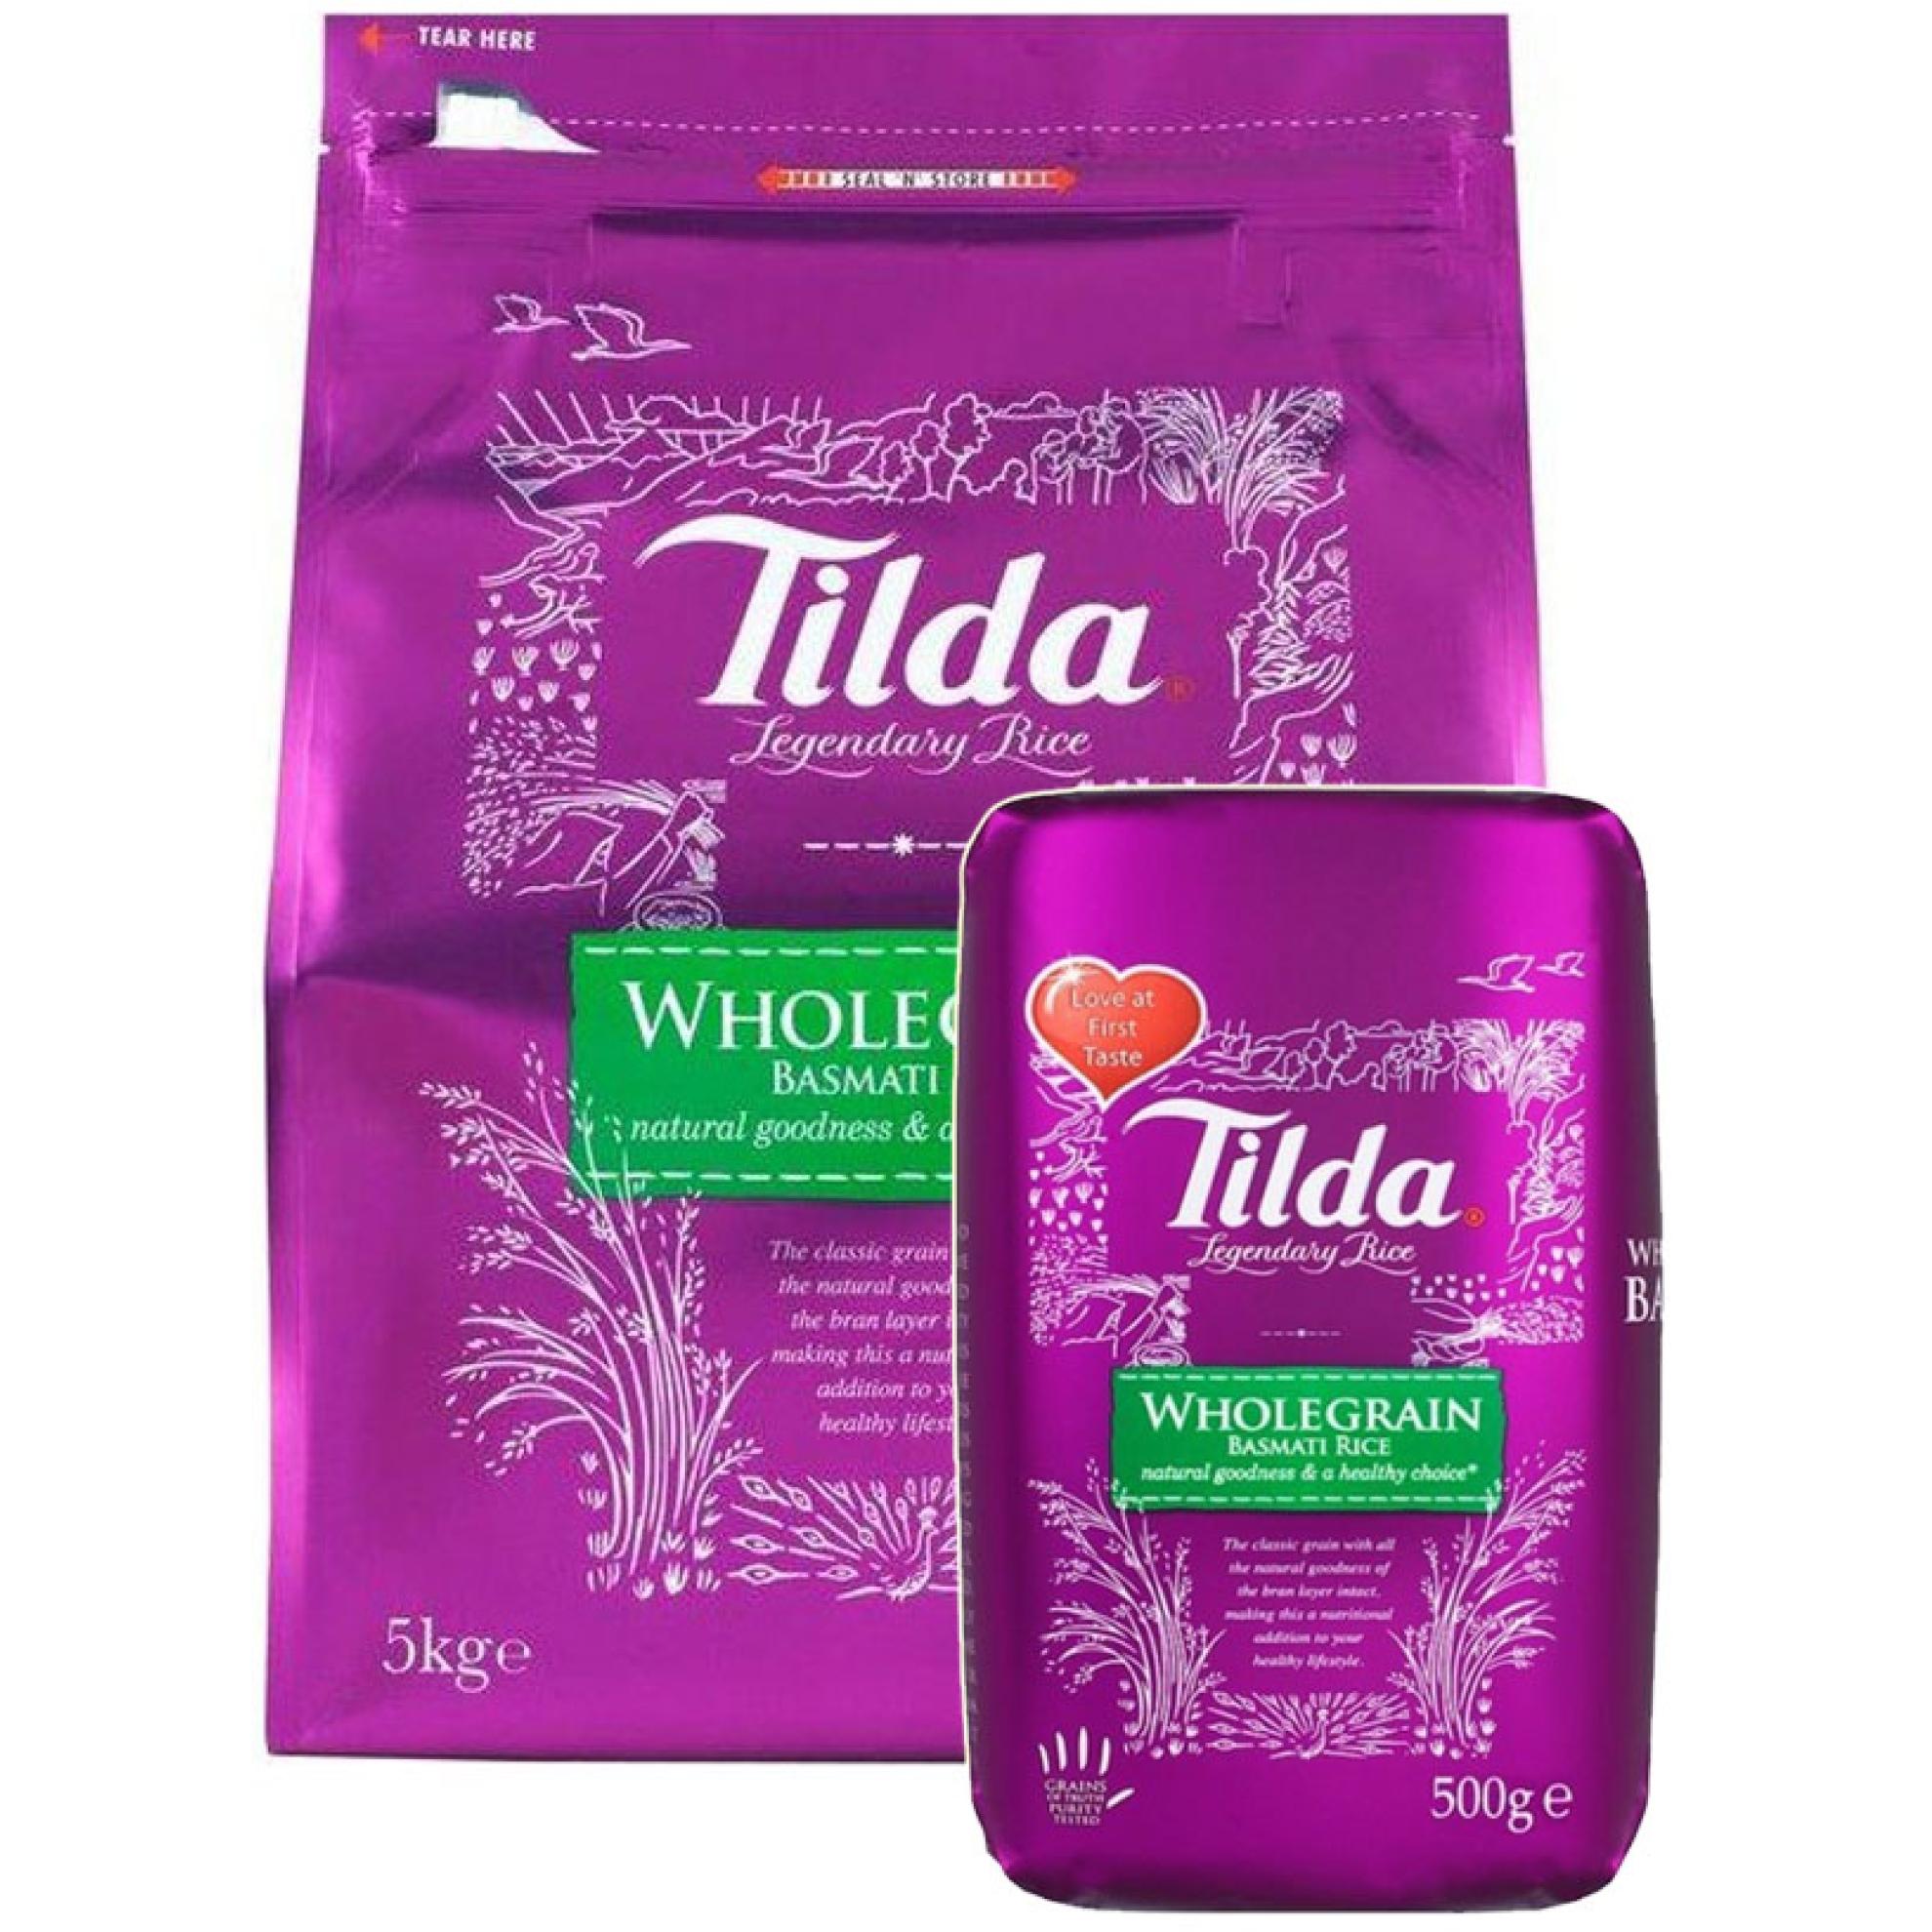 Tilda Wholegrain Basmati Rice